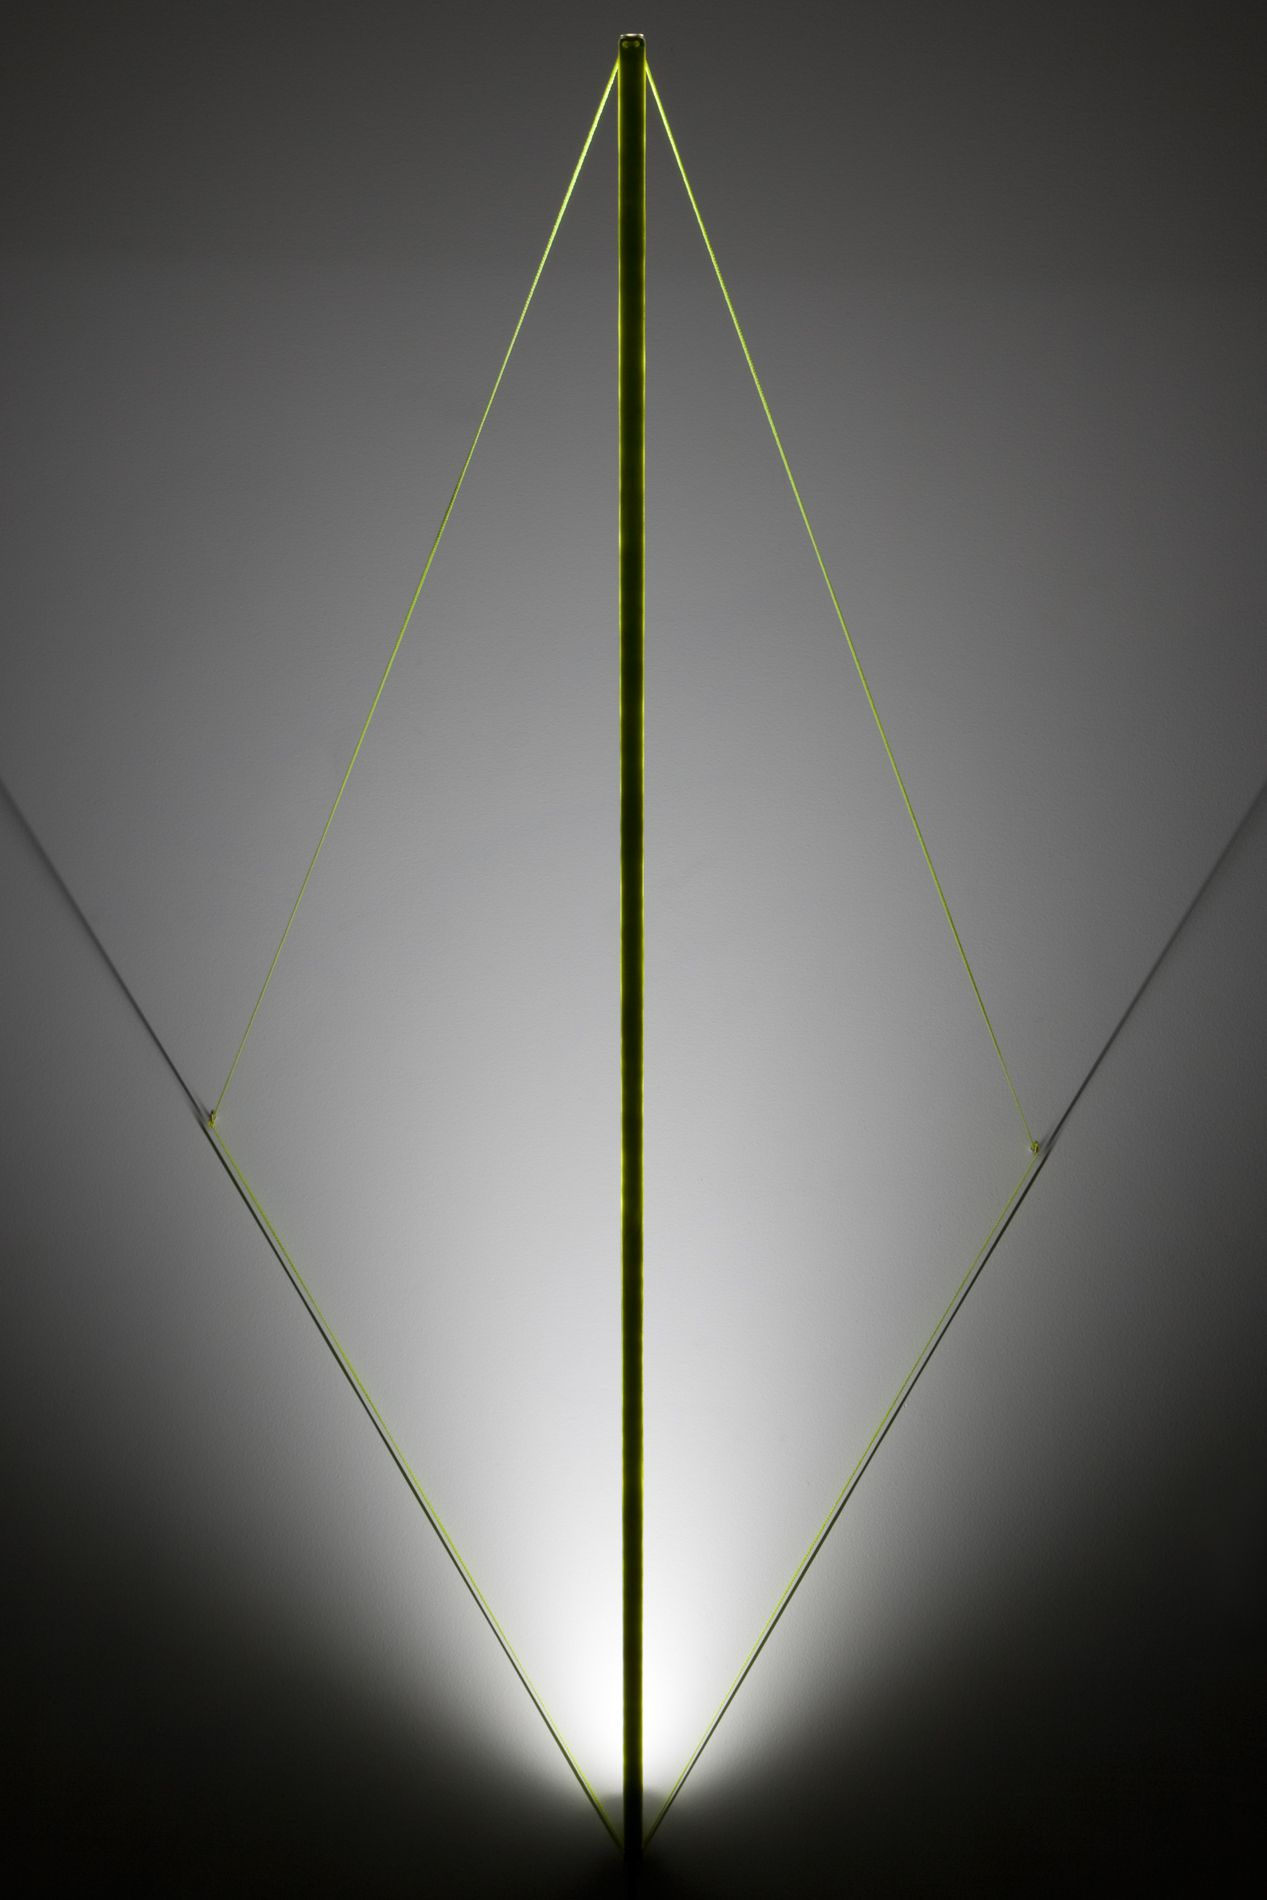 100g lamp designed by lucas & bianca